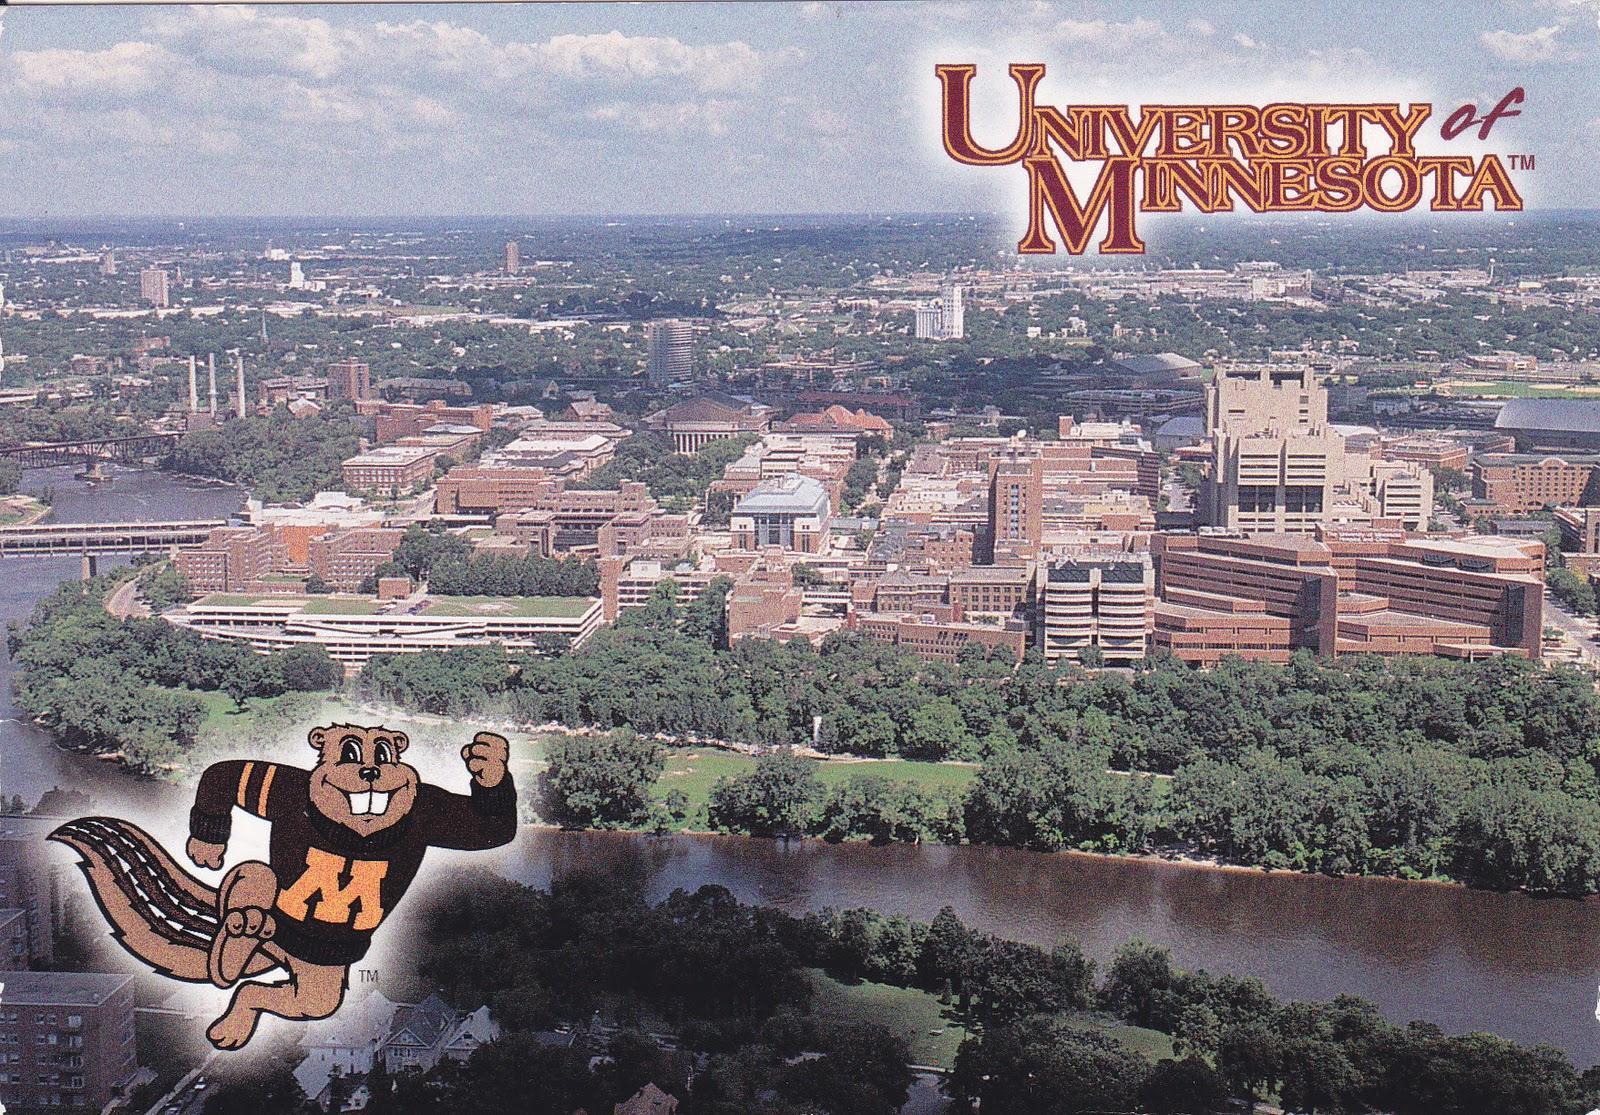 My World-wide postcard: USA-University of Minnesota